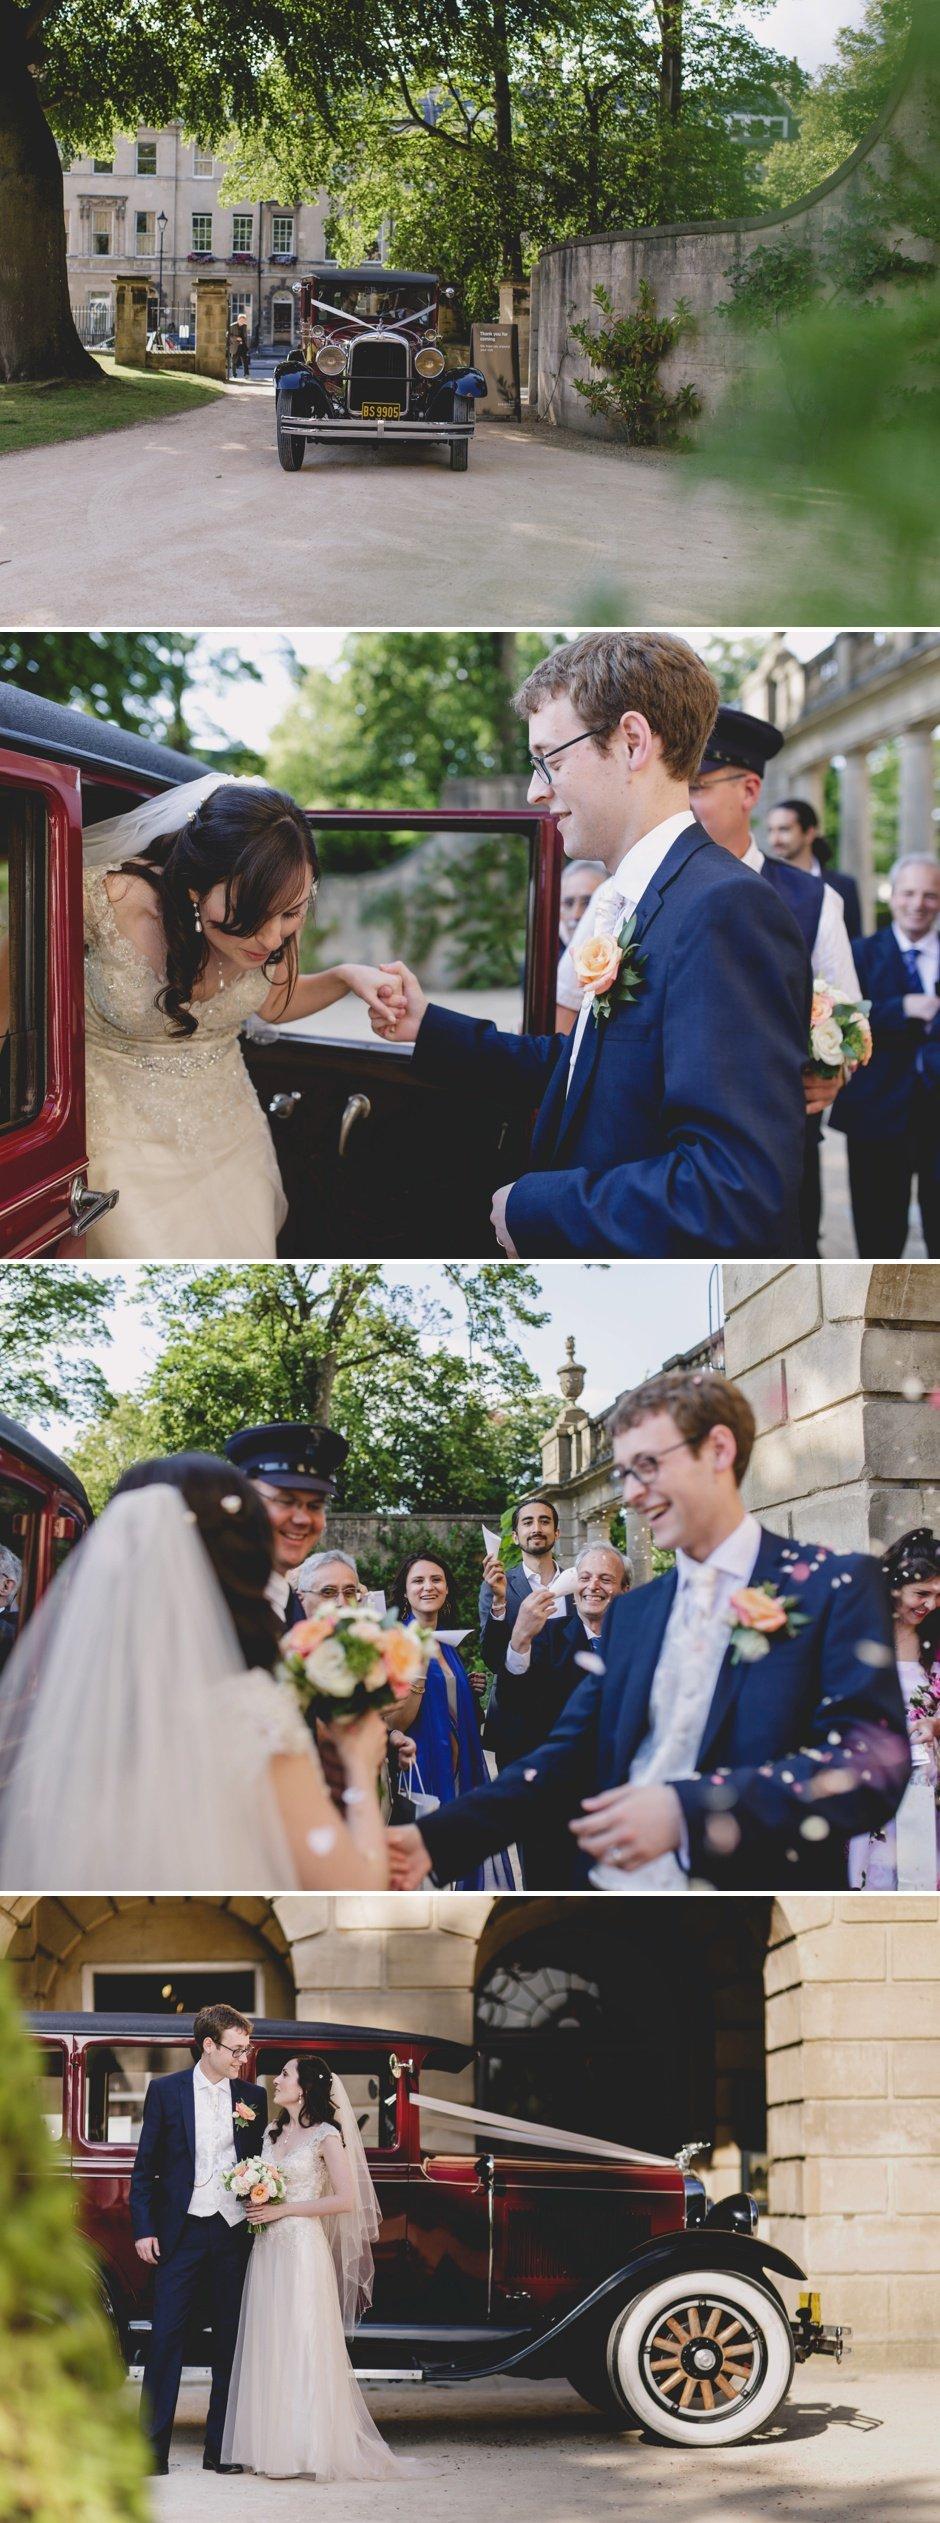 Holborne Bath Wedding Photography_0014